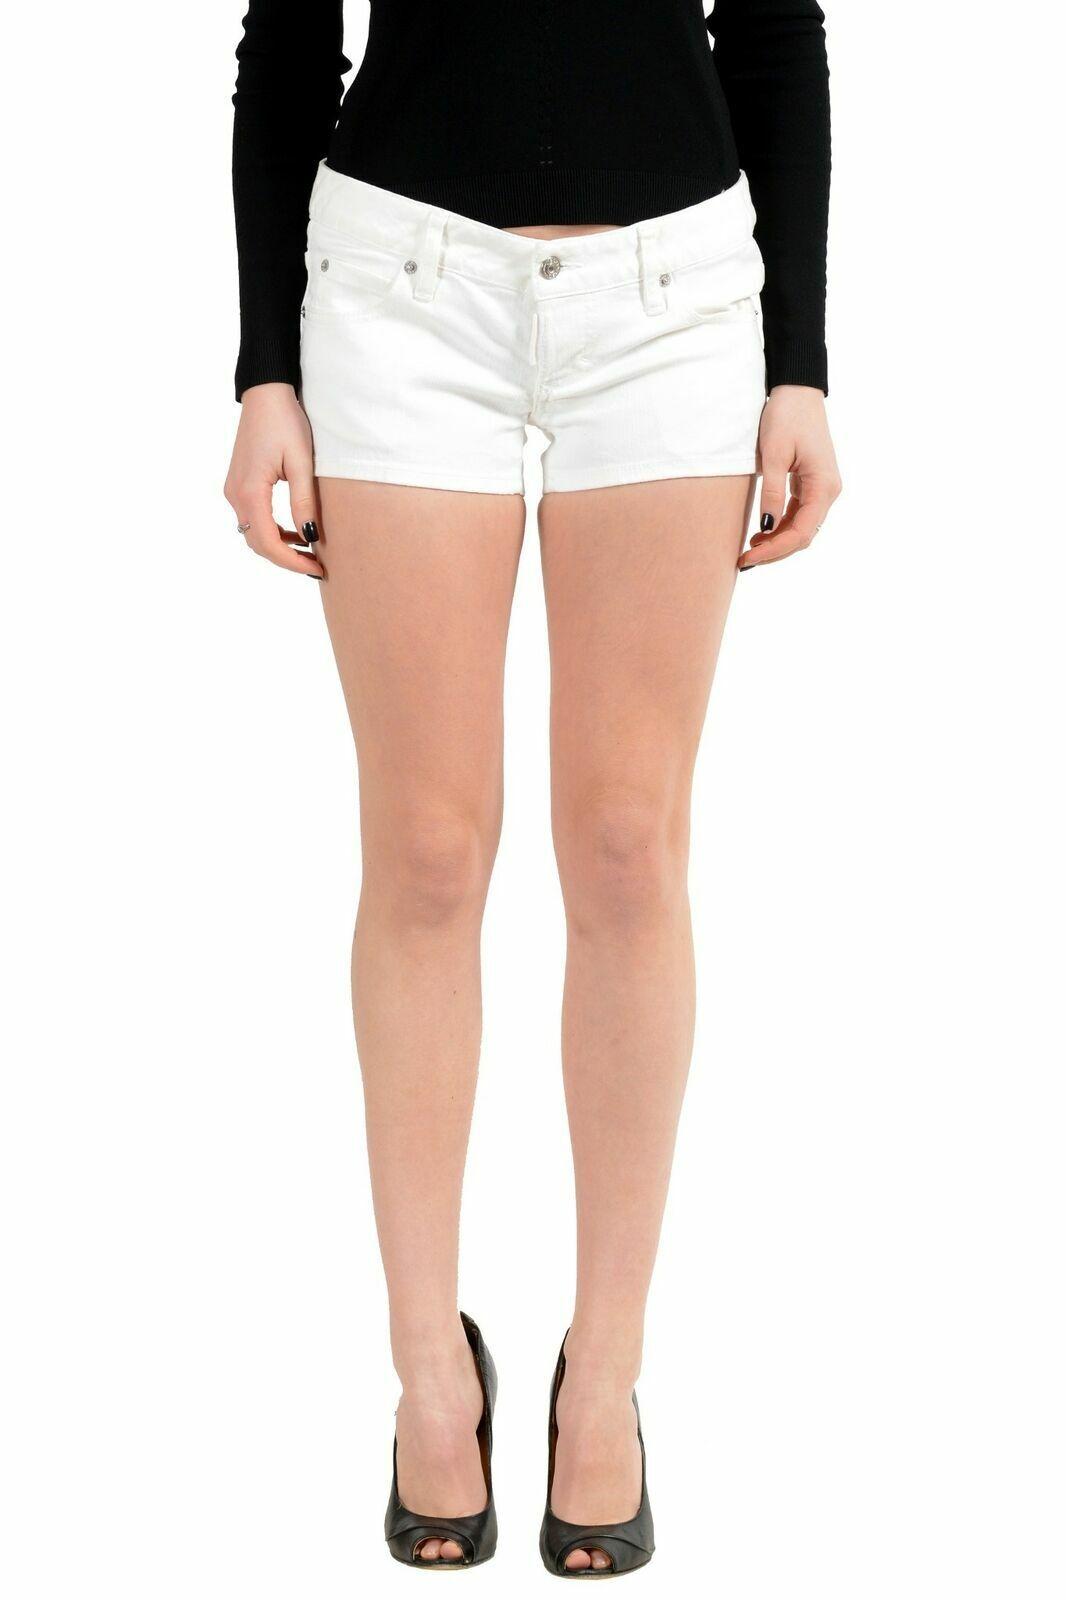 Dsquared2 Women's White Stretch Denim Casual Mini Shorts US 4 IT 40